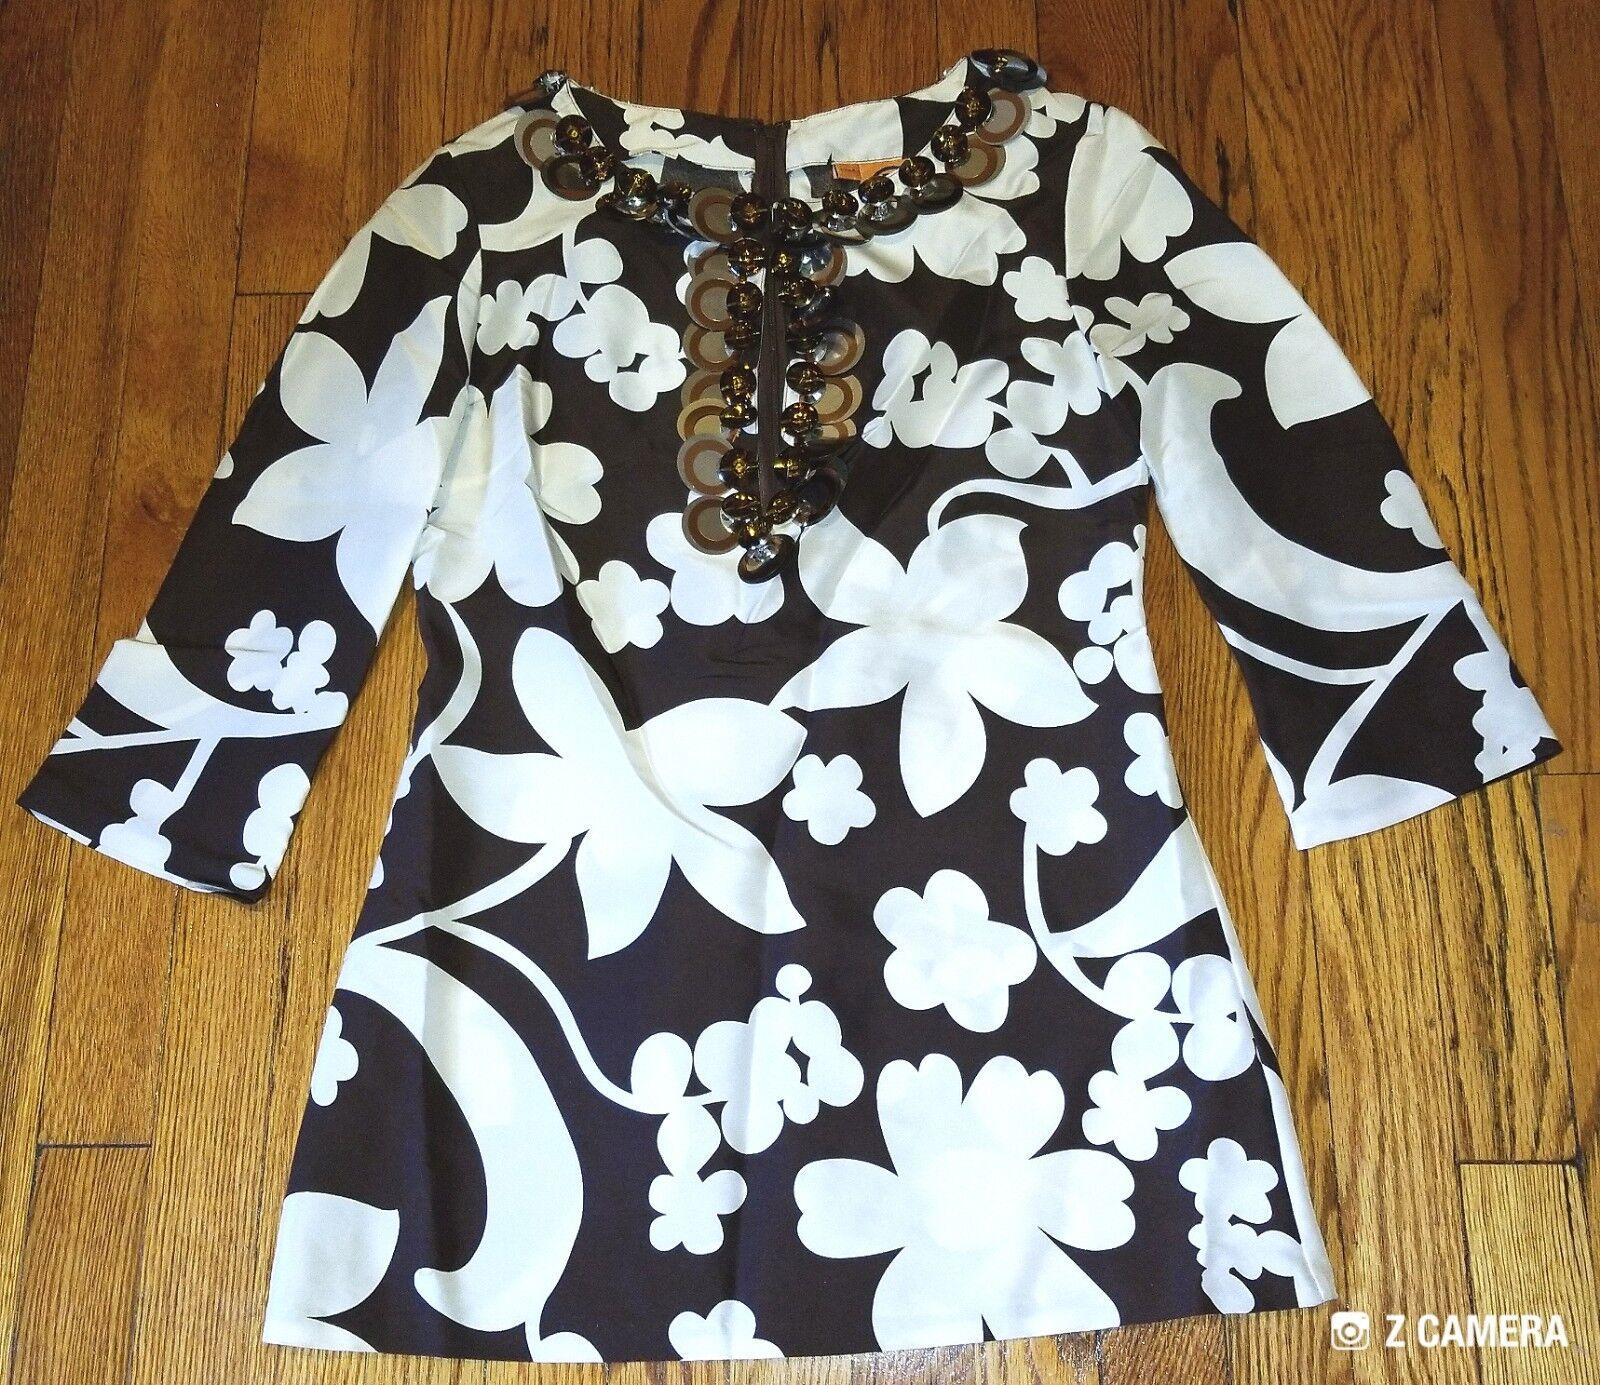 Tory Burch braun and Weiß Accented Silk Shirt Größe 2